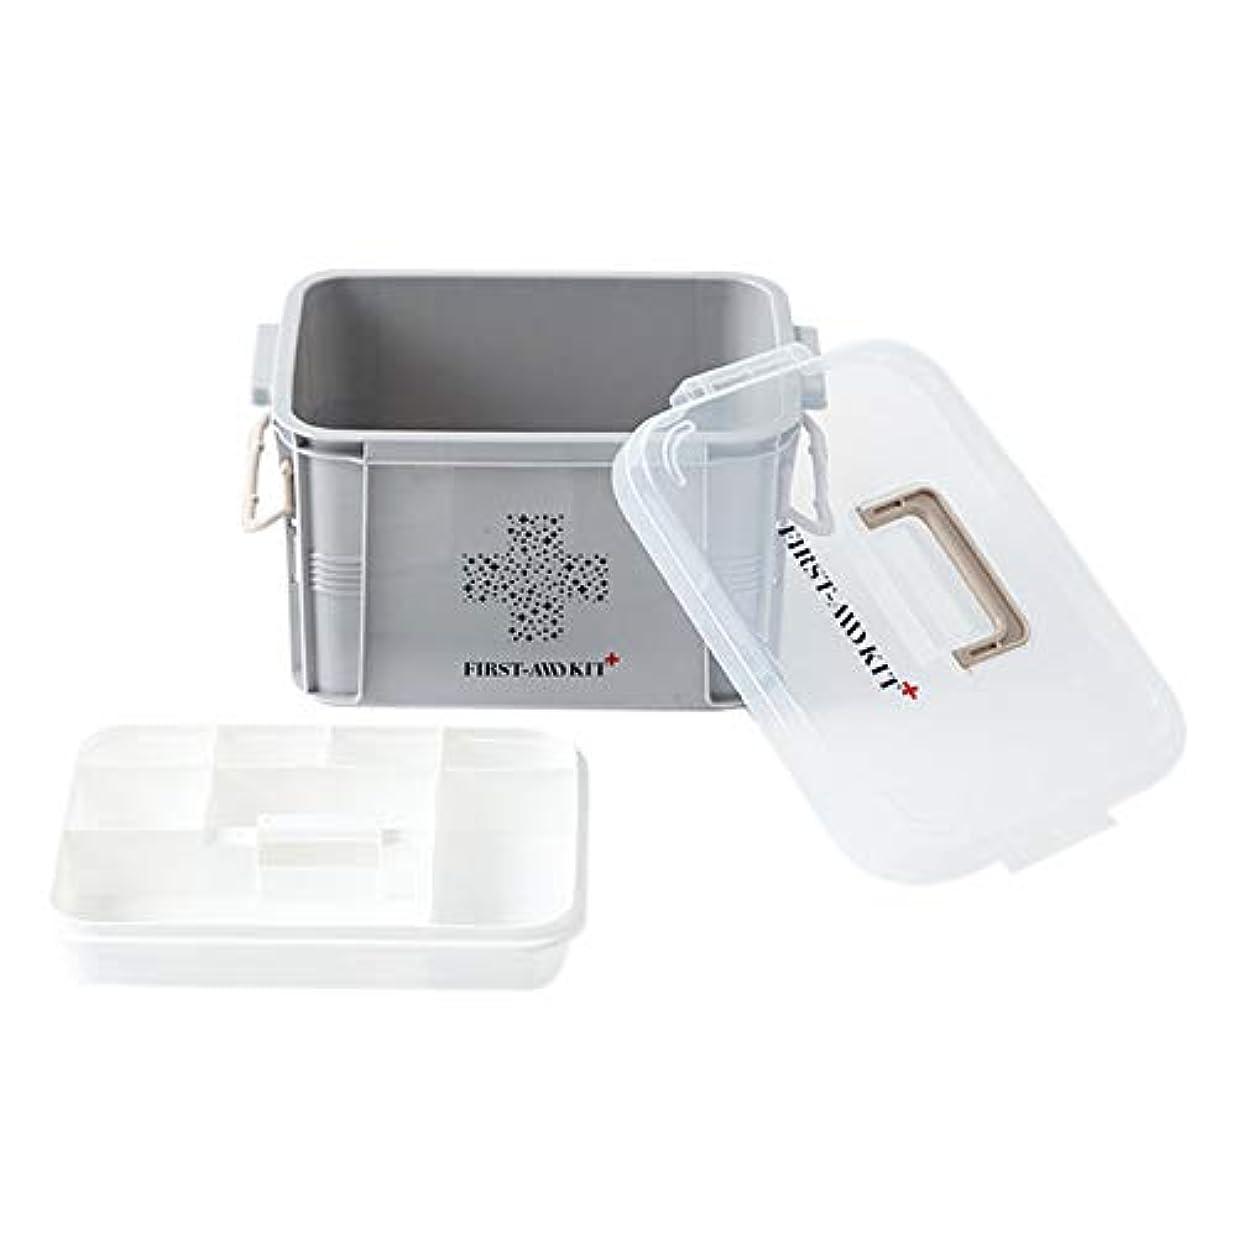 CUHAWUDBA プラスチック製医療ボックス、収納容器、多層医療箱、北欧家庭用整理ボックス(Sグレー)